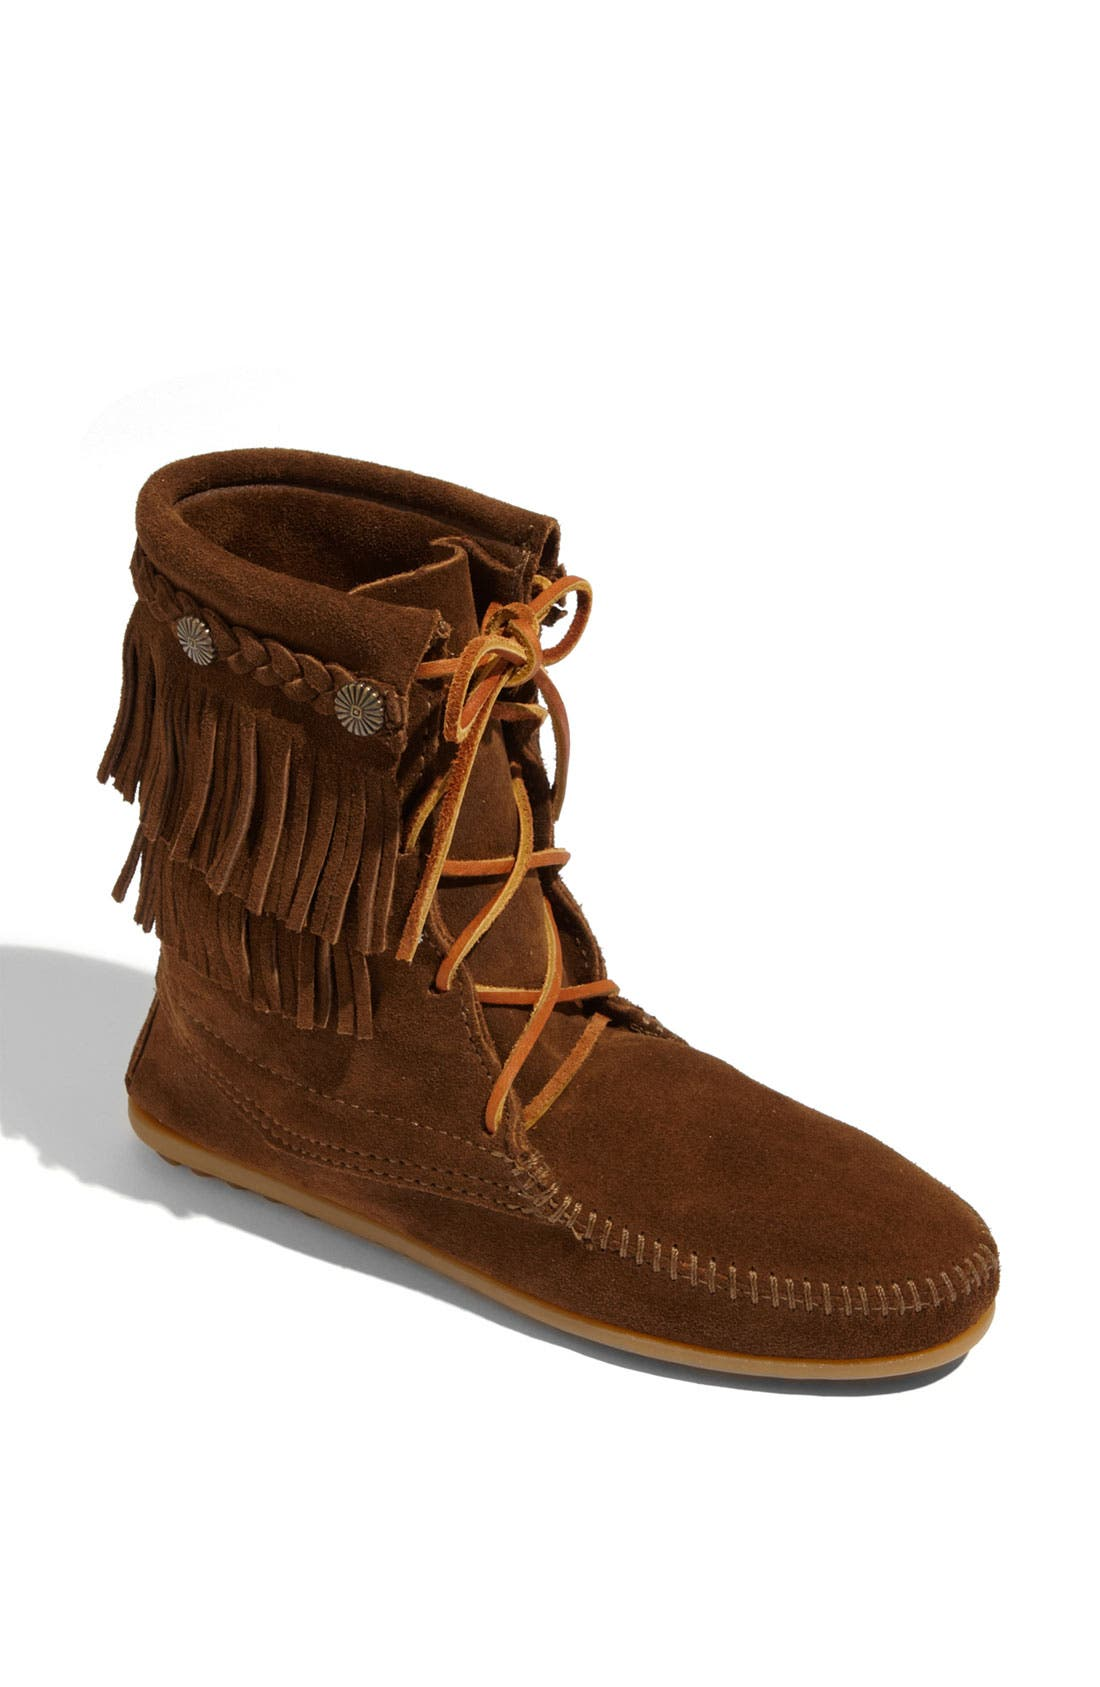 Alternate Image 1 Selected - Minnetonka 'Tramper' Double Fringe Moccasin Boot (Women)